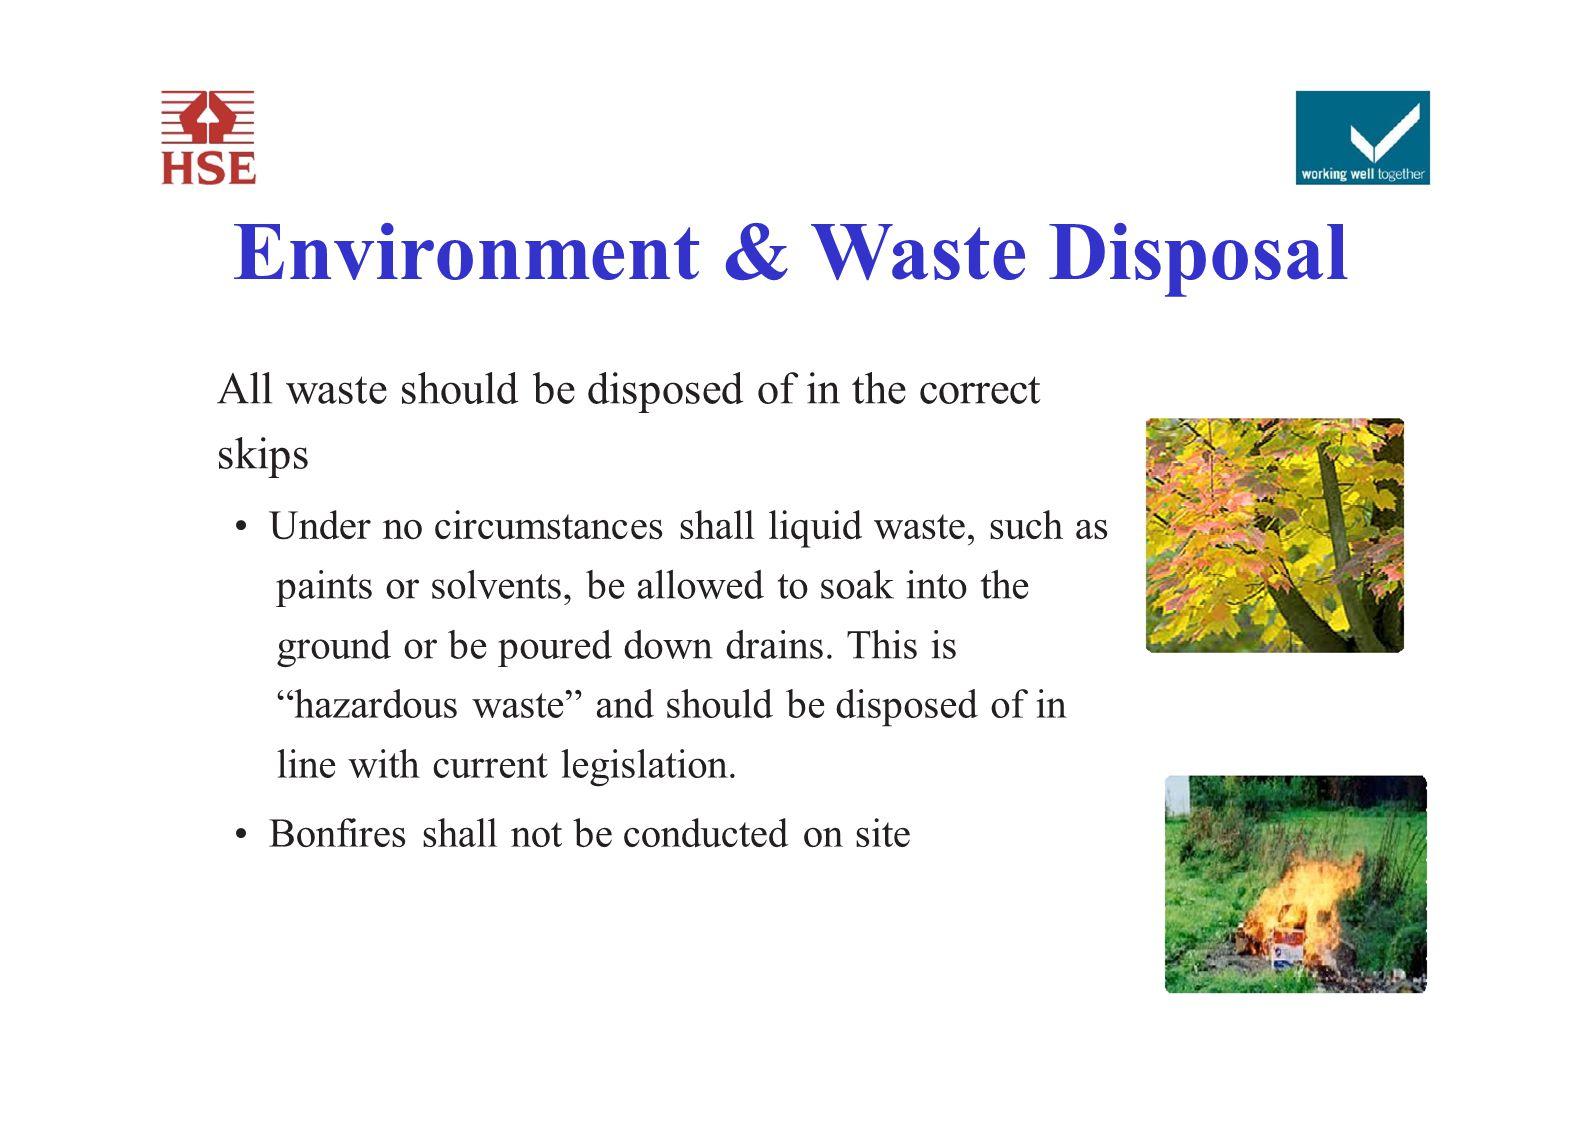 Environment & Waste Disposal